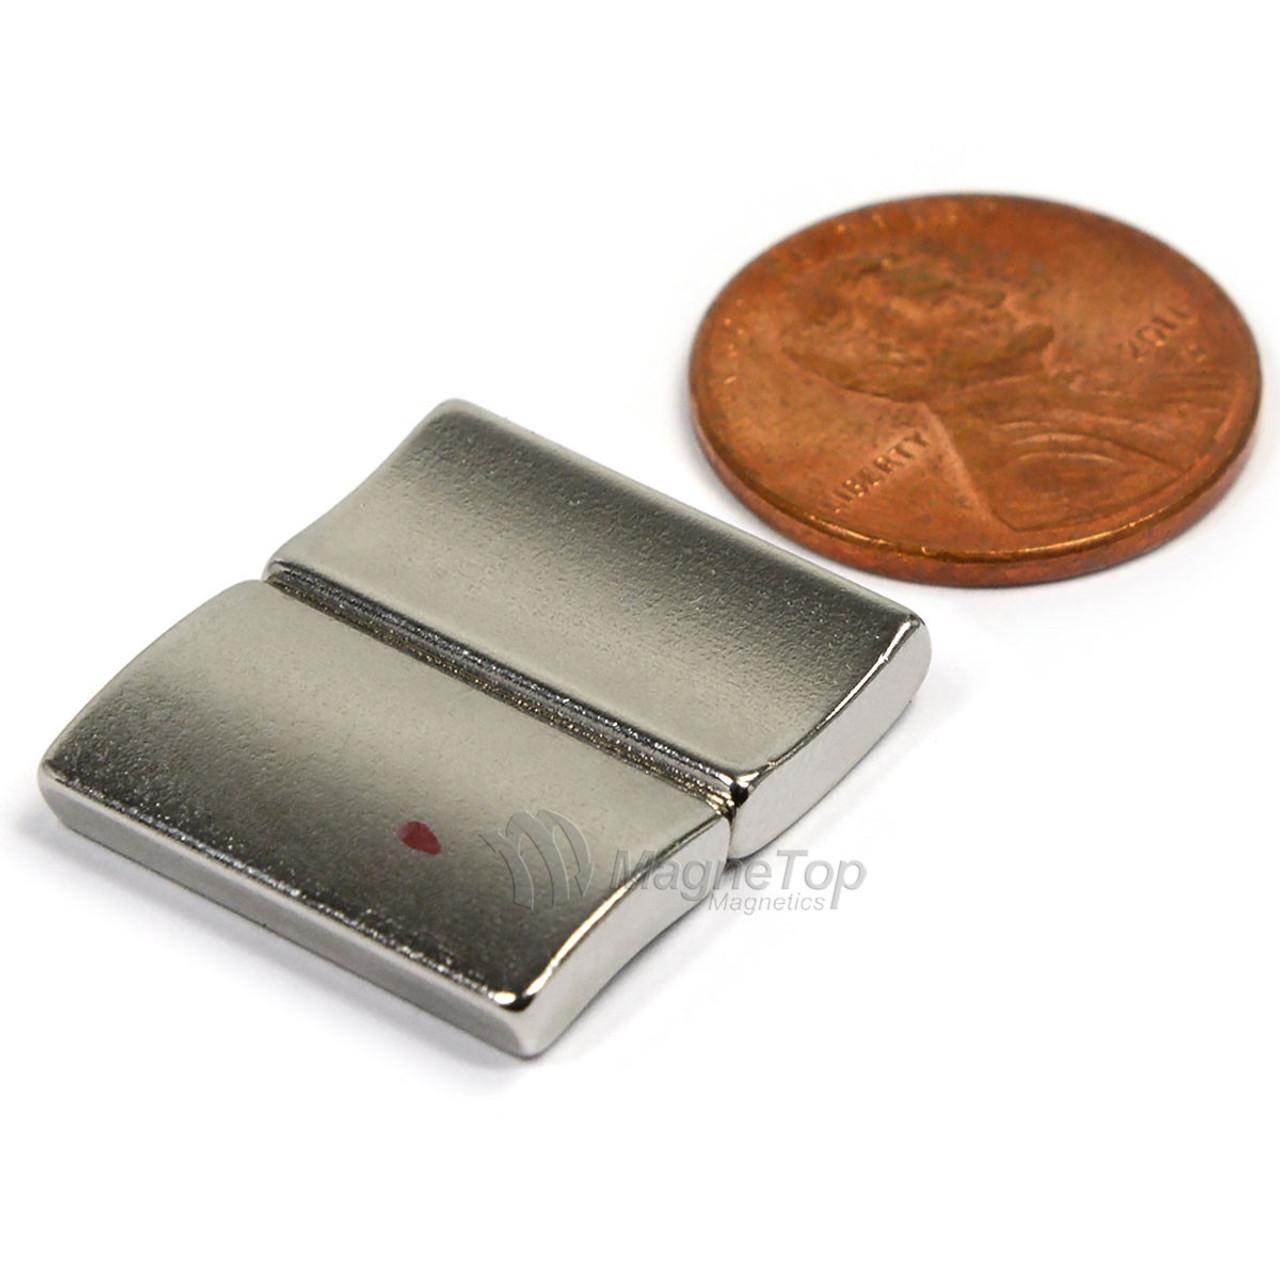 38.1mm (OD) x 31.75mm(ID) x 19mm 36 Degree -N42HT-S Pole Neodymium Arc